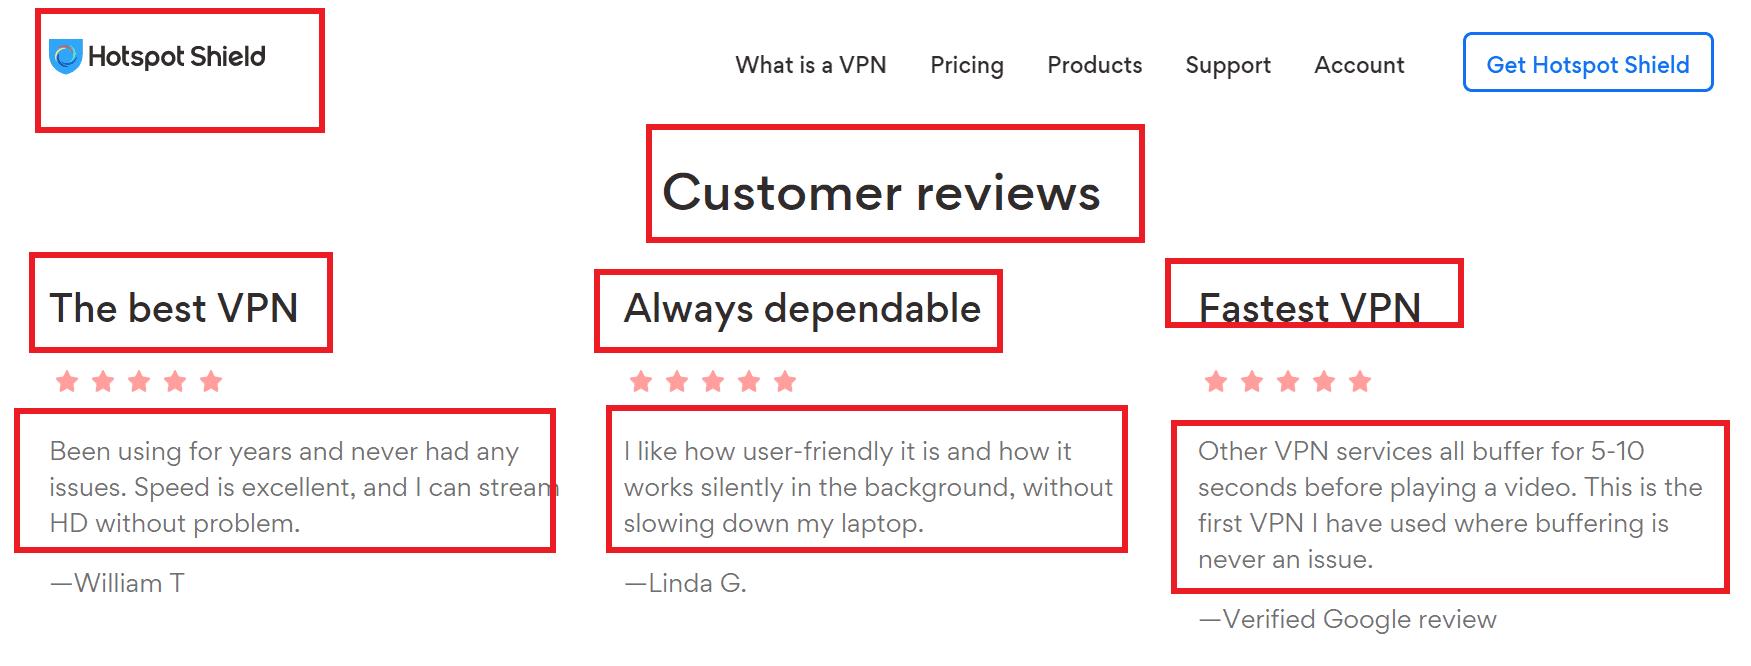 hotspot shield customer reviews